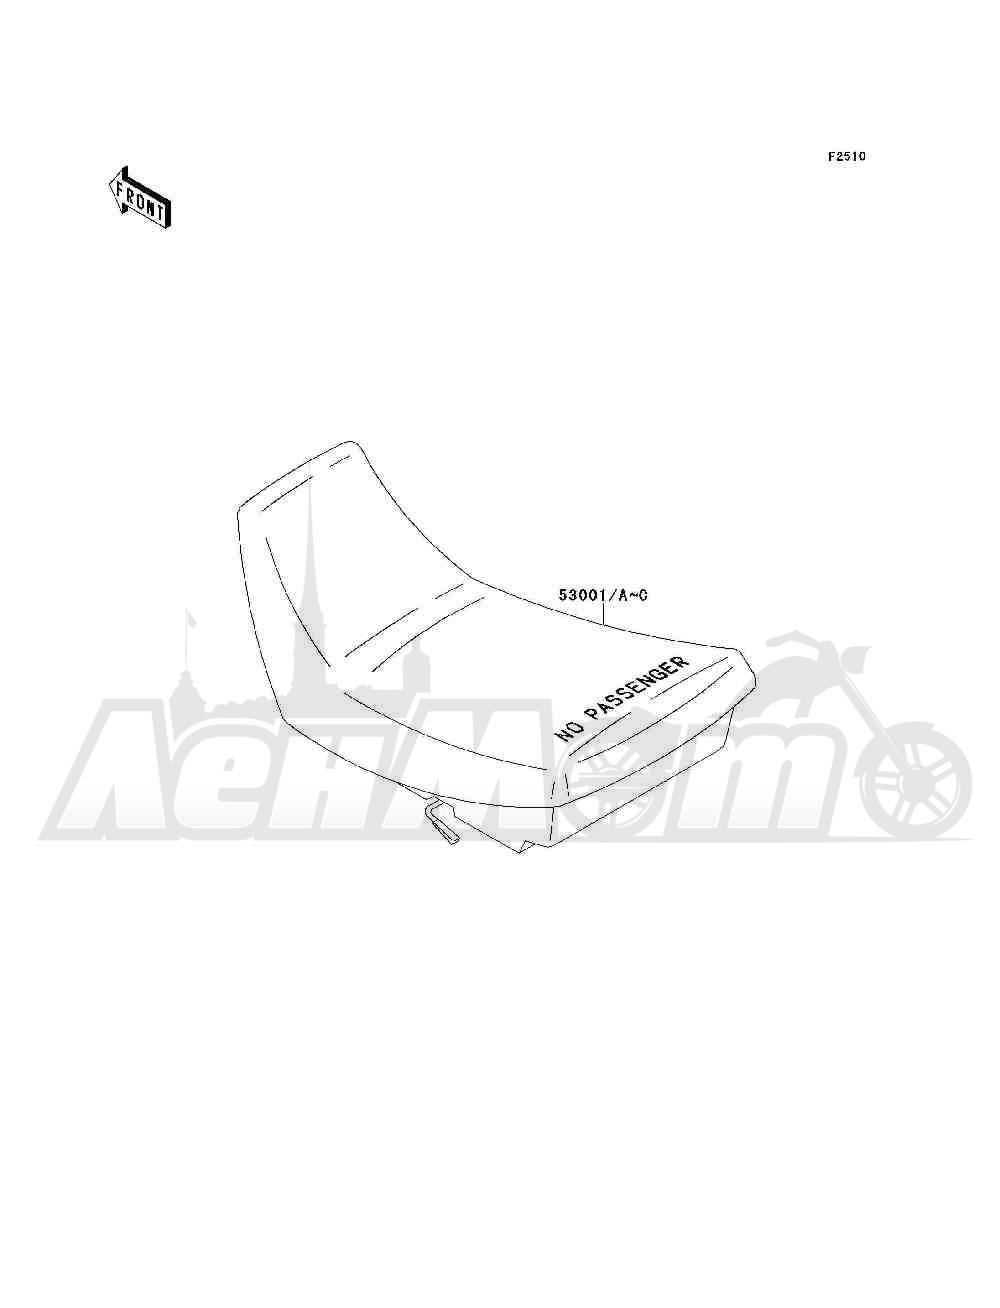 Запчасти для Квадроцикла Kawasaki 1993 BAYOU 300 4X4 (KLF300-C5) Раздел: SEAT | сиденье